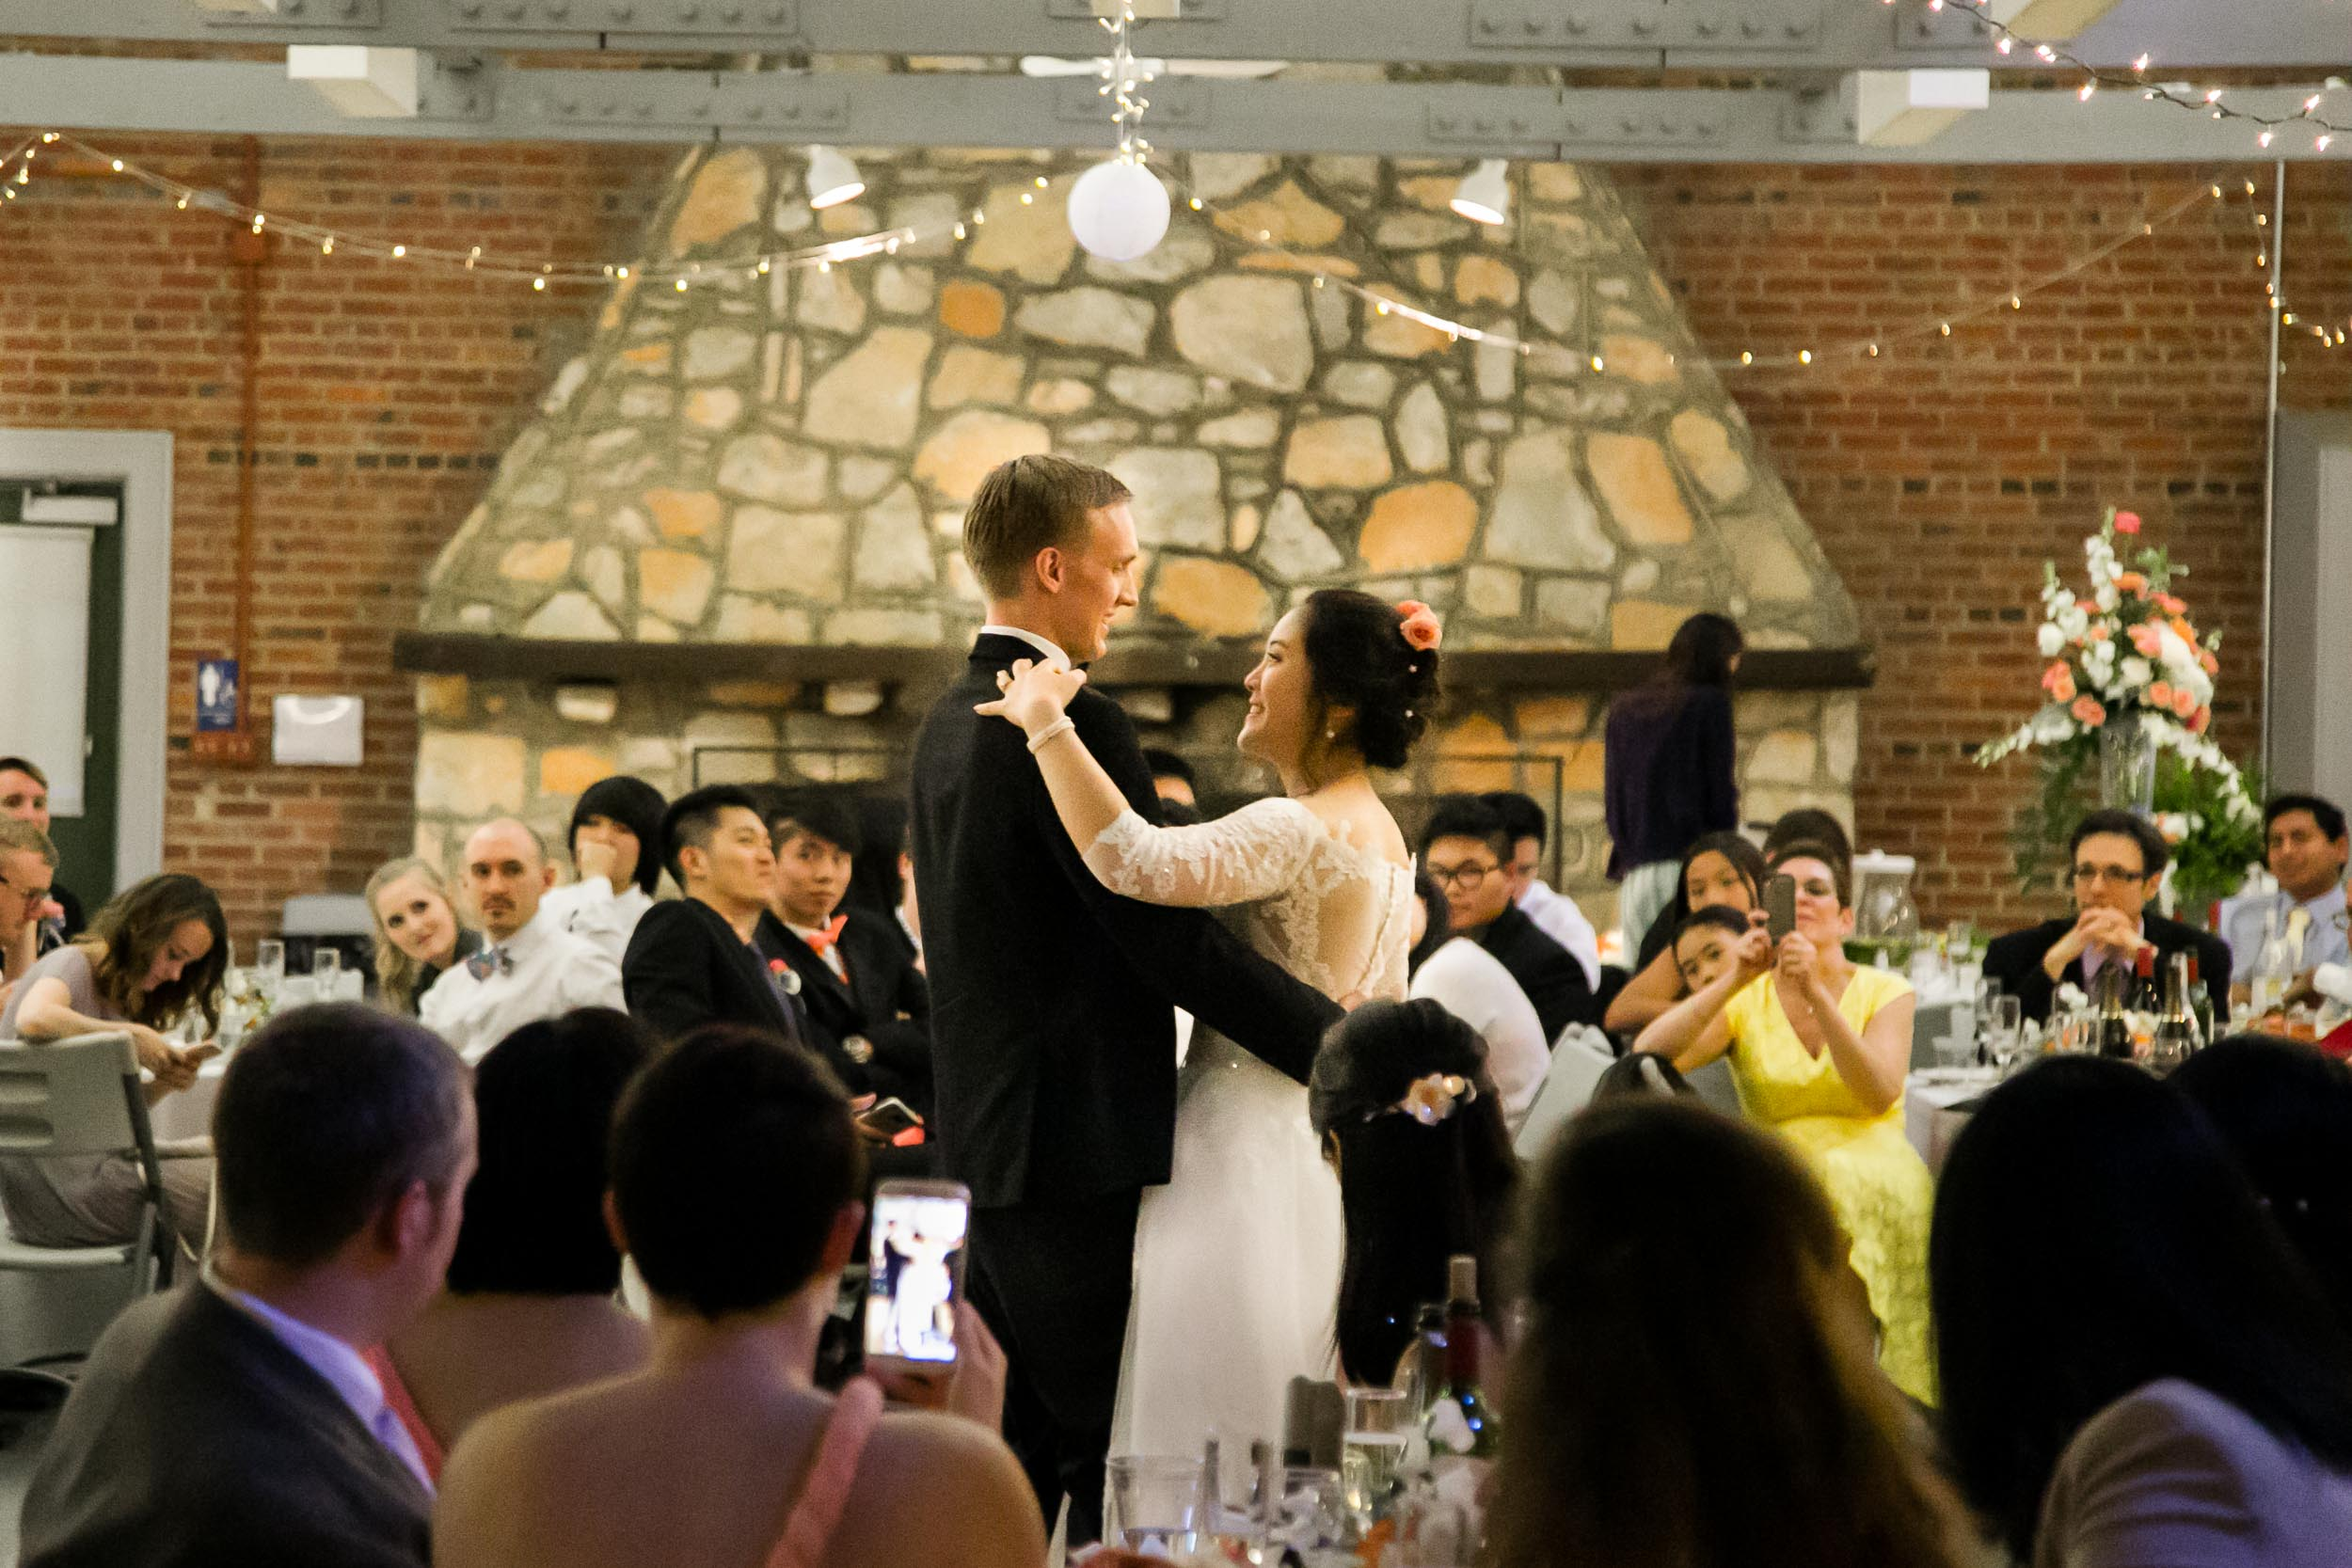 Raleigh Wedding Photographer | G. Lin Photography | Bride and groom dancing